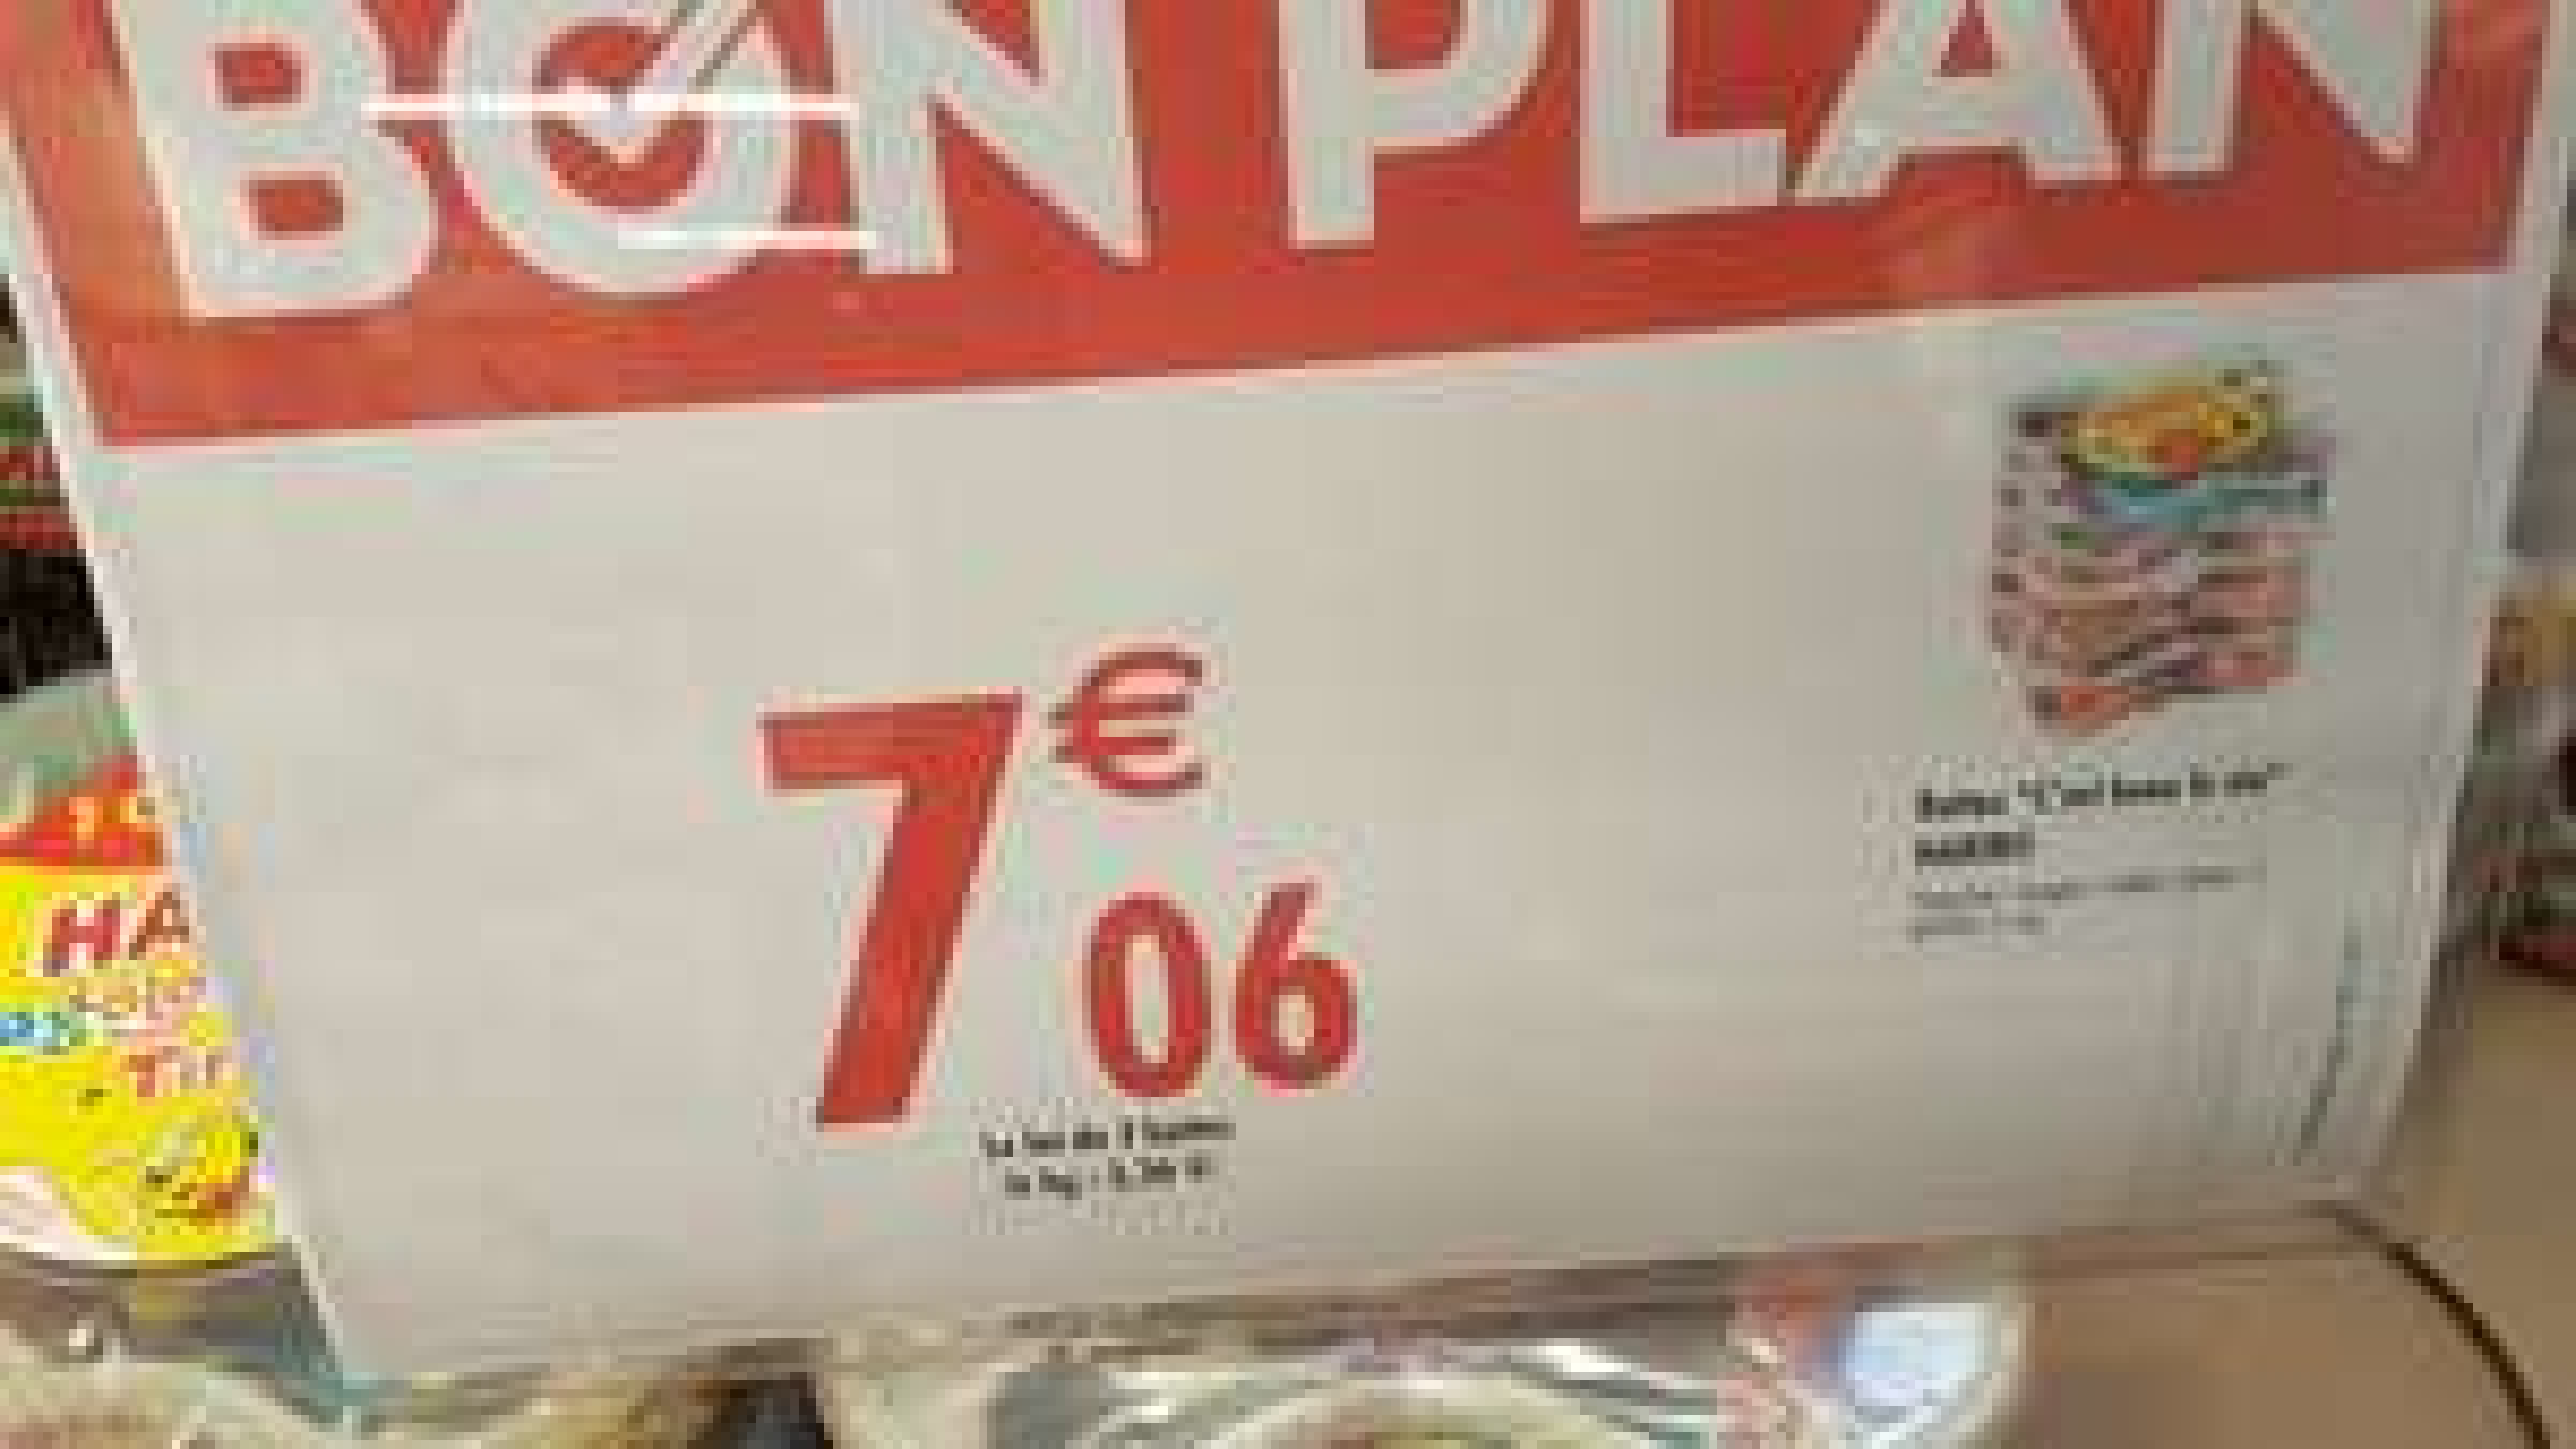 Lot de 3 boites Haribo Happy box + Dragolo + Tribbidi - 2,1 Kg à Carrefour Hyper Meylan (38)